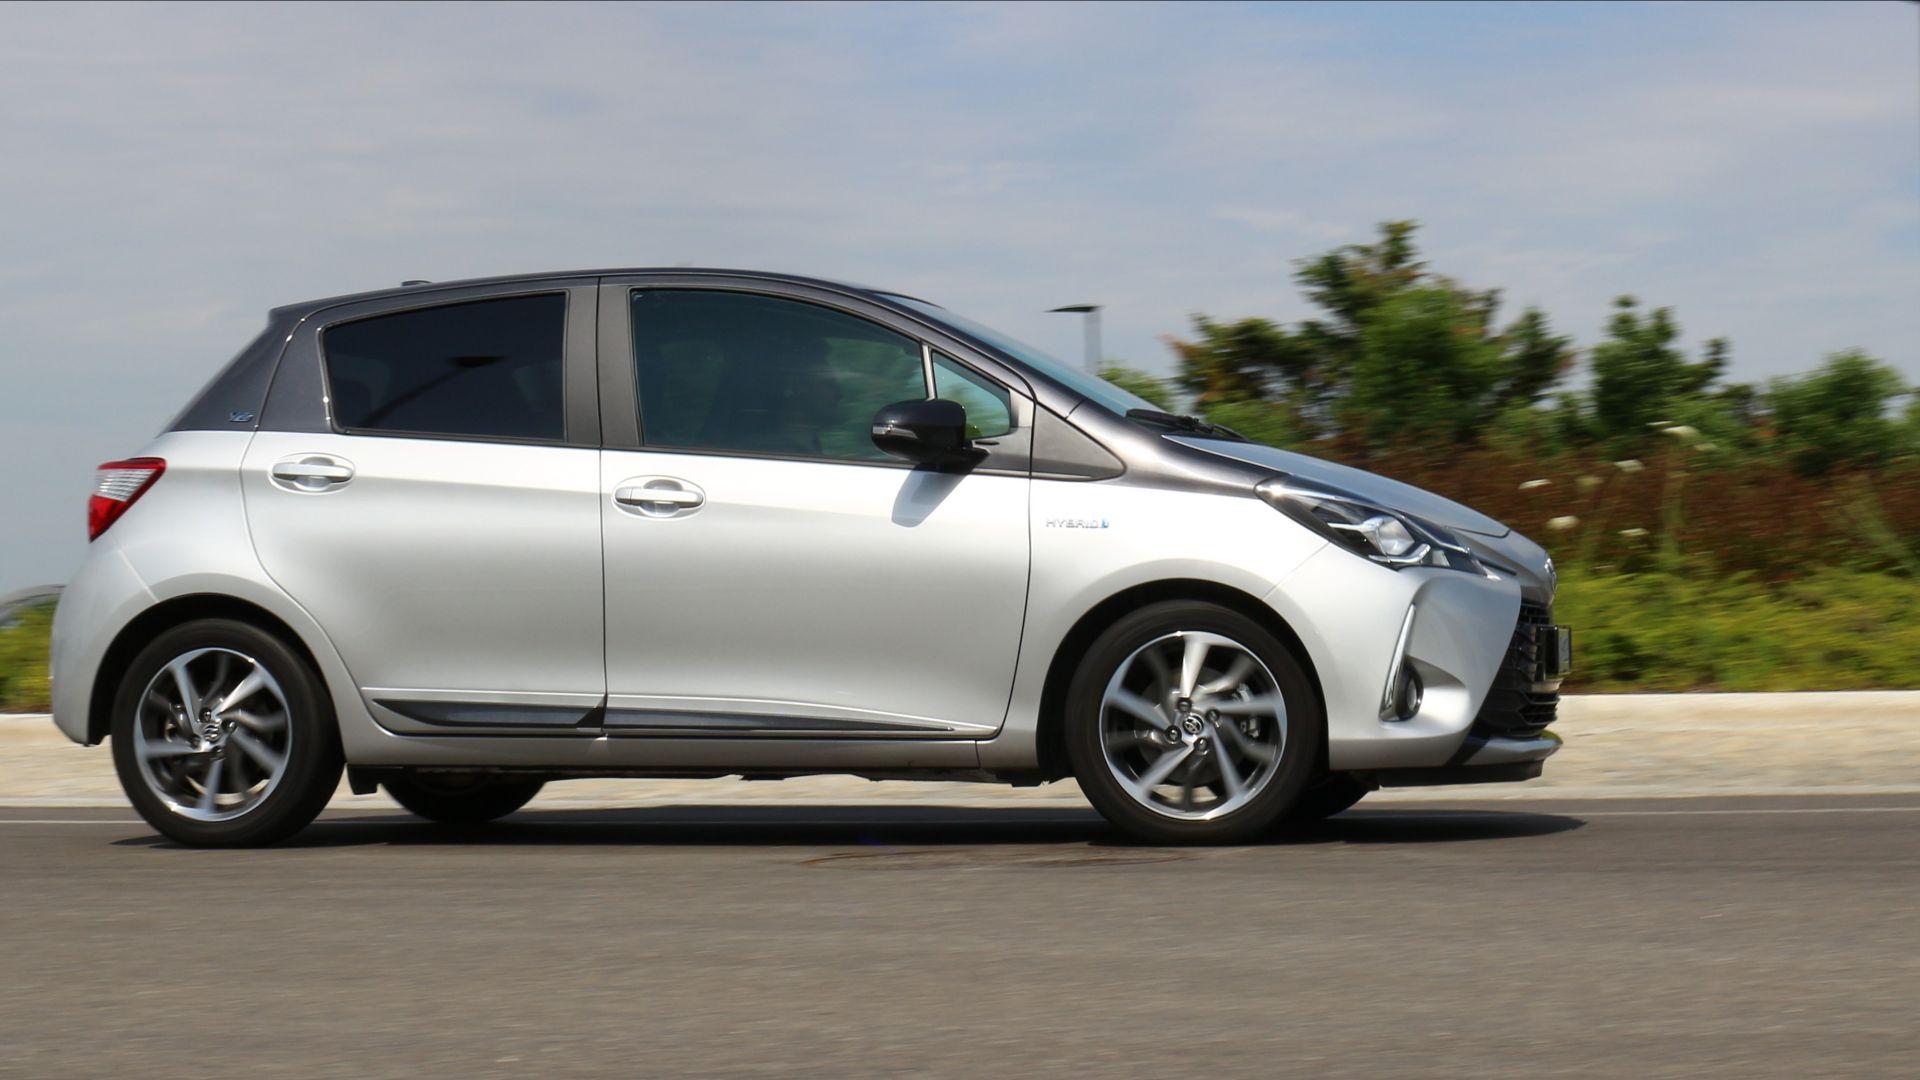 Test Toyota Yaris Hybrid Y20 1 5  Prova  Prezzo  Dimensioni